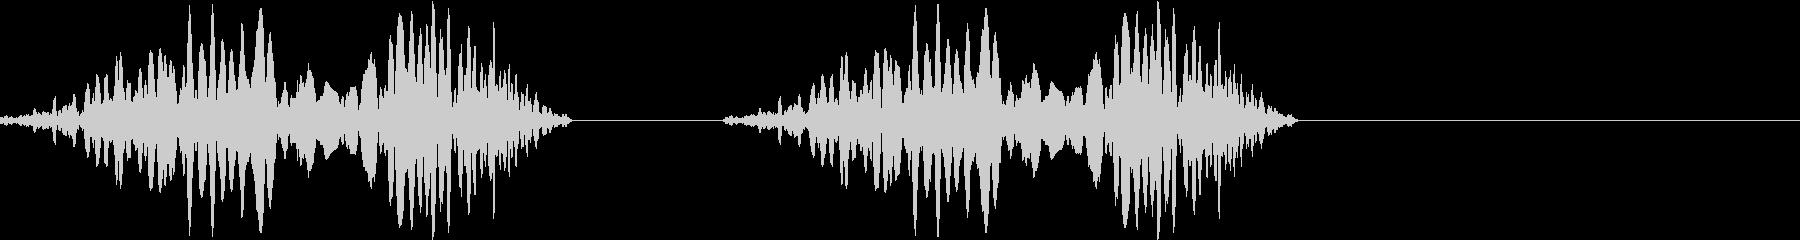 DJプレイ スクラッチ・ノイズ 183の未再生の波形